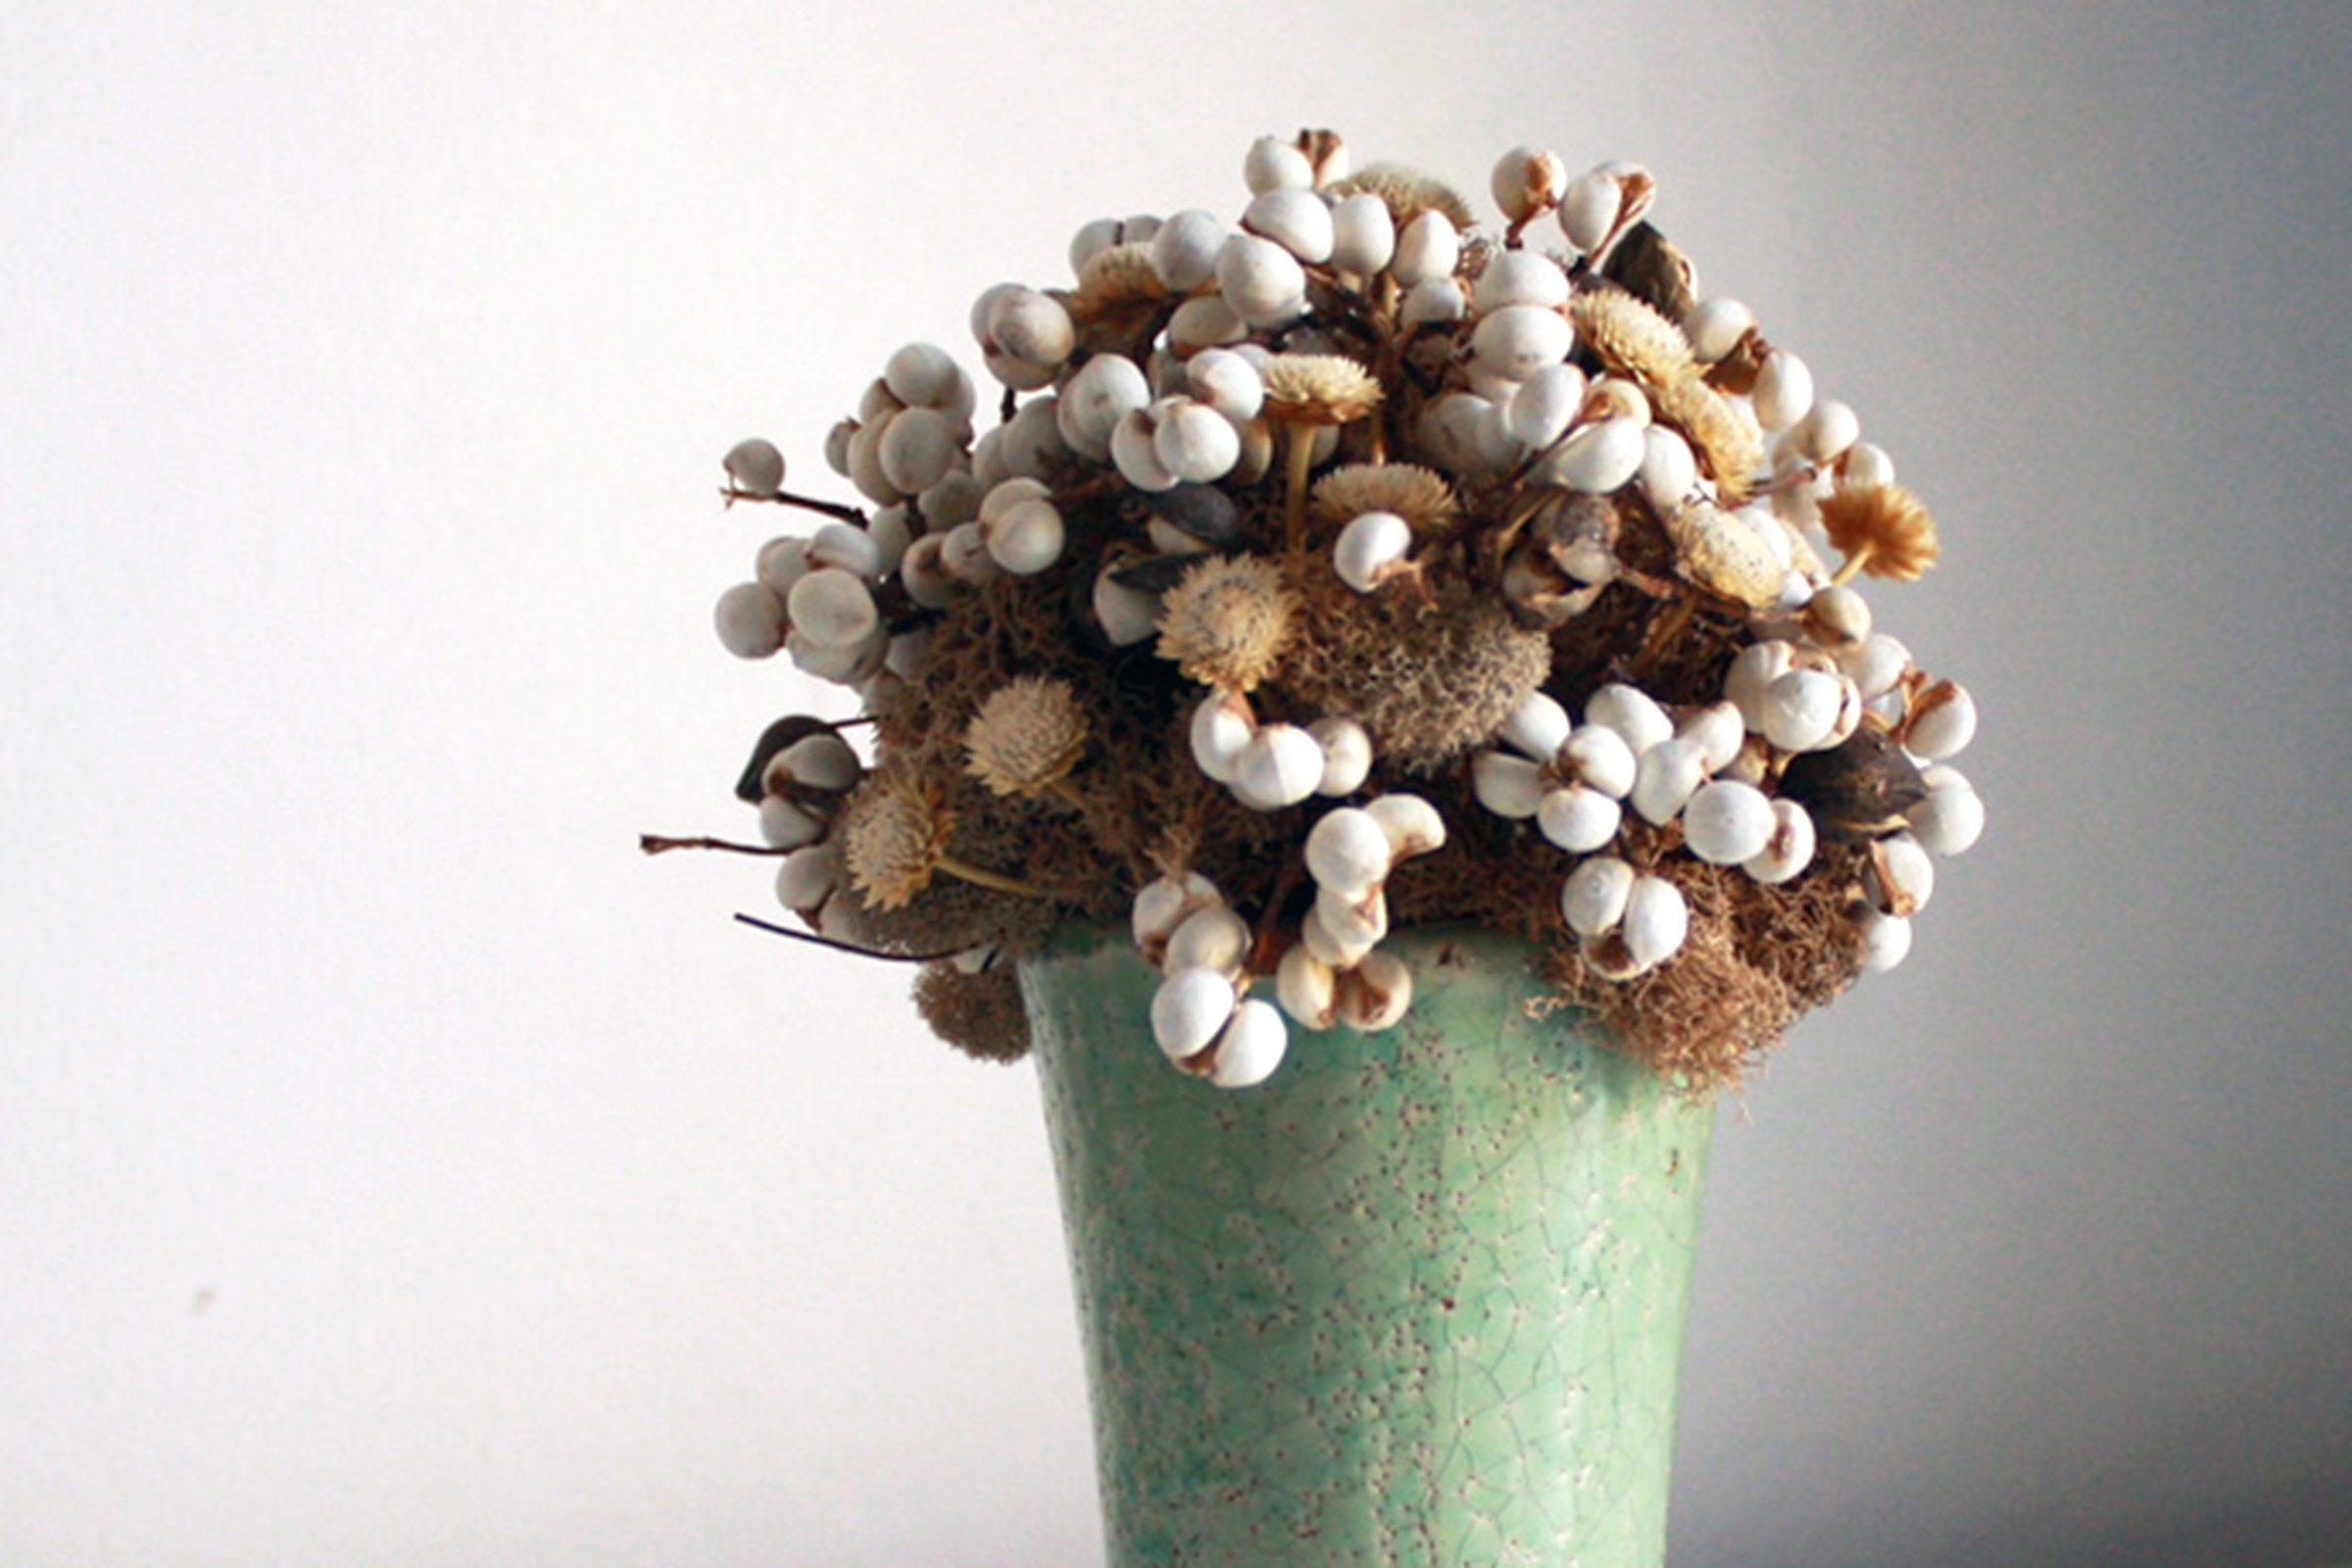 Preserve your petals how to dry flowers readers digest courtesy christina morenoflores del sol izmirmasajfo